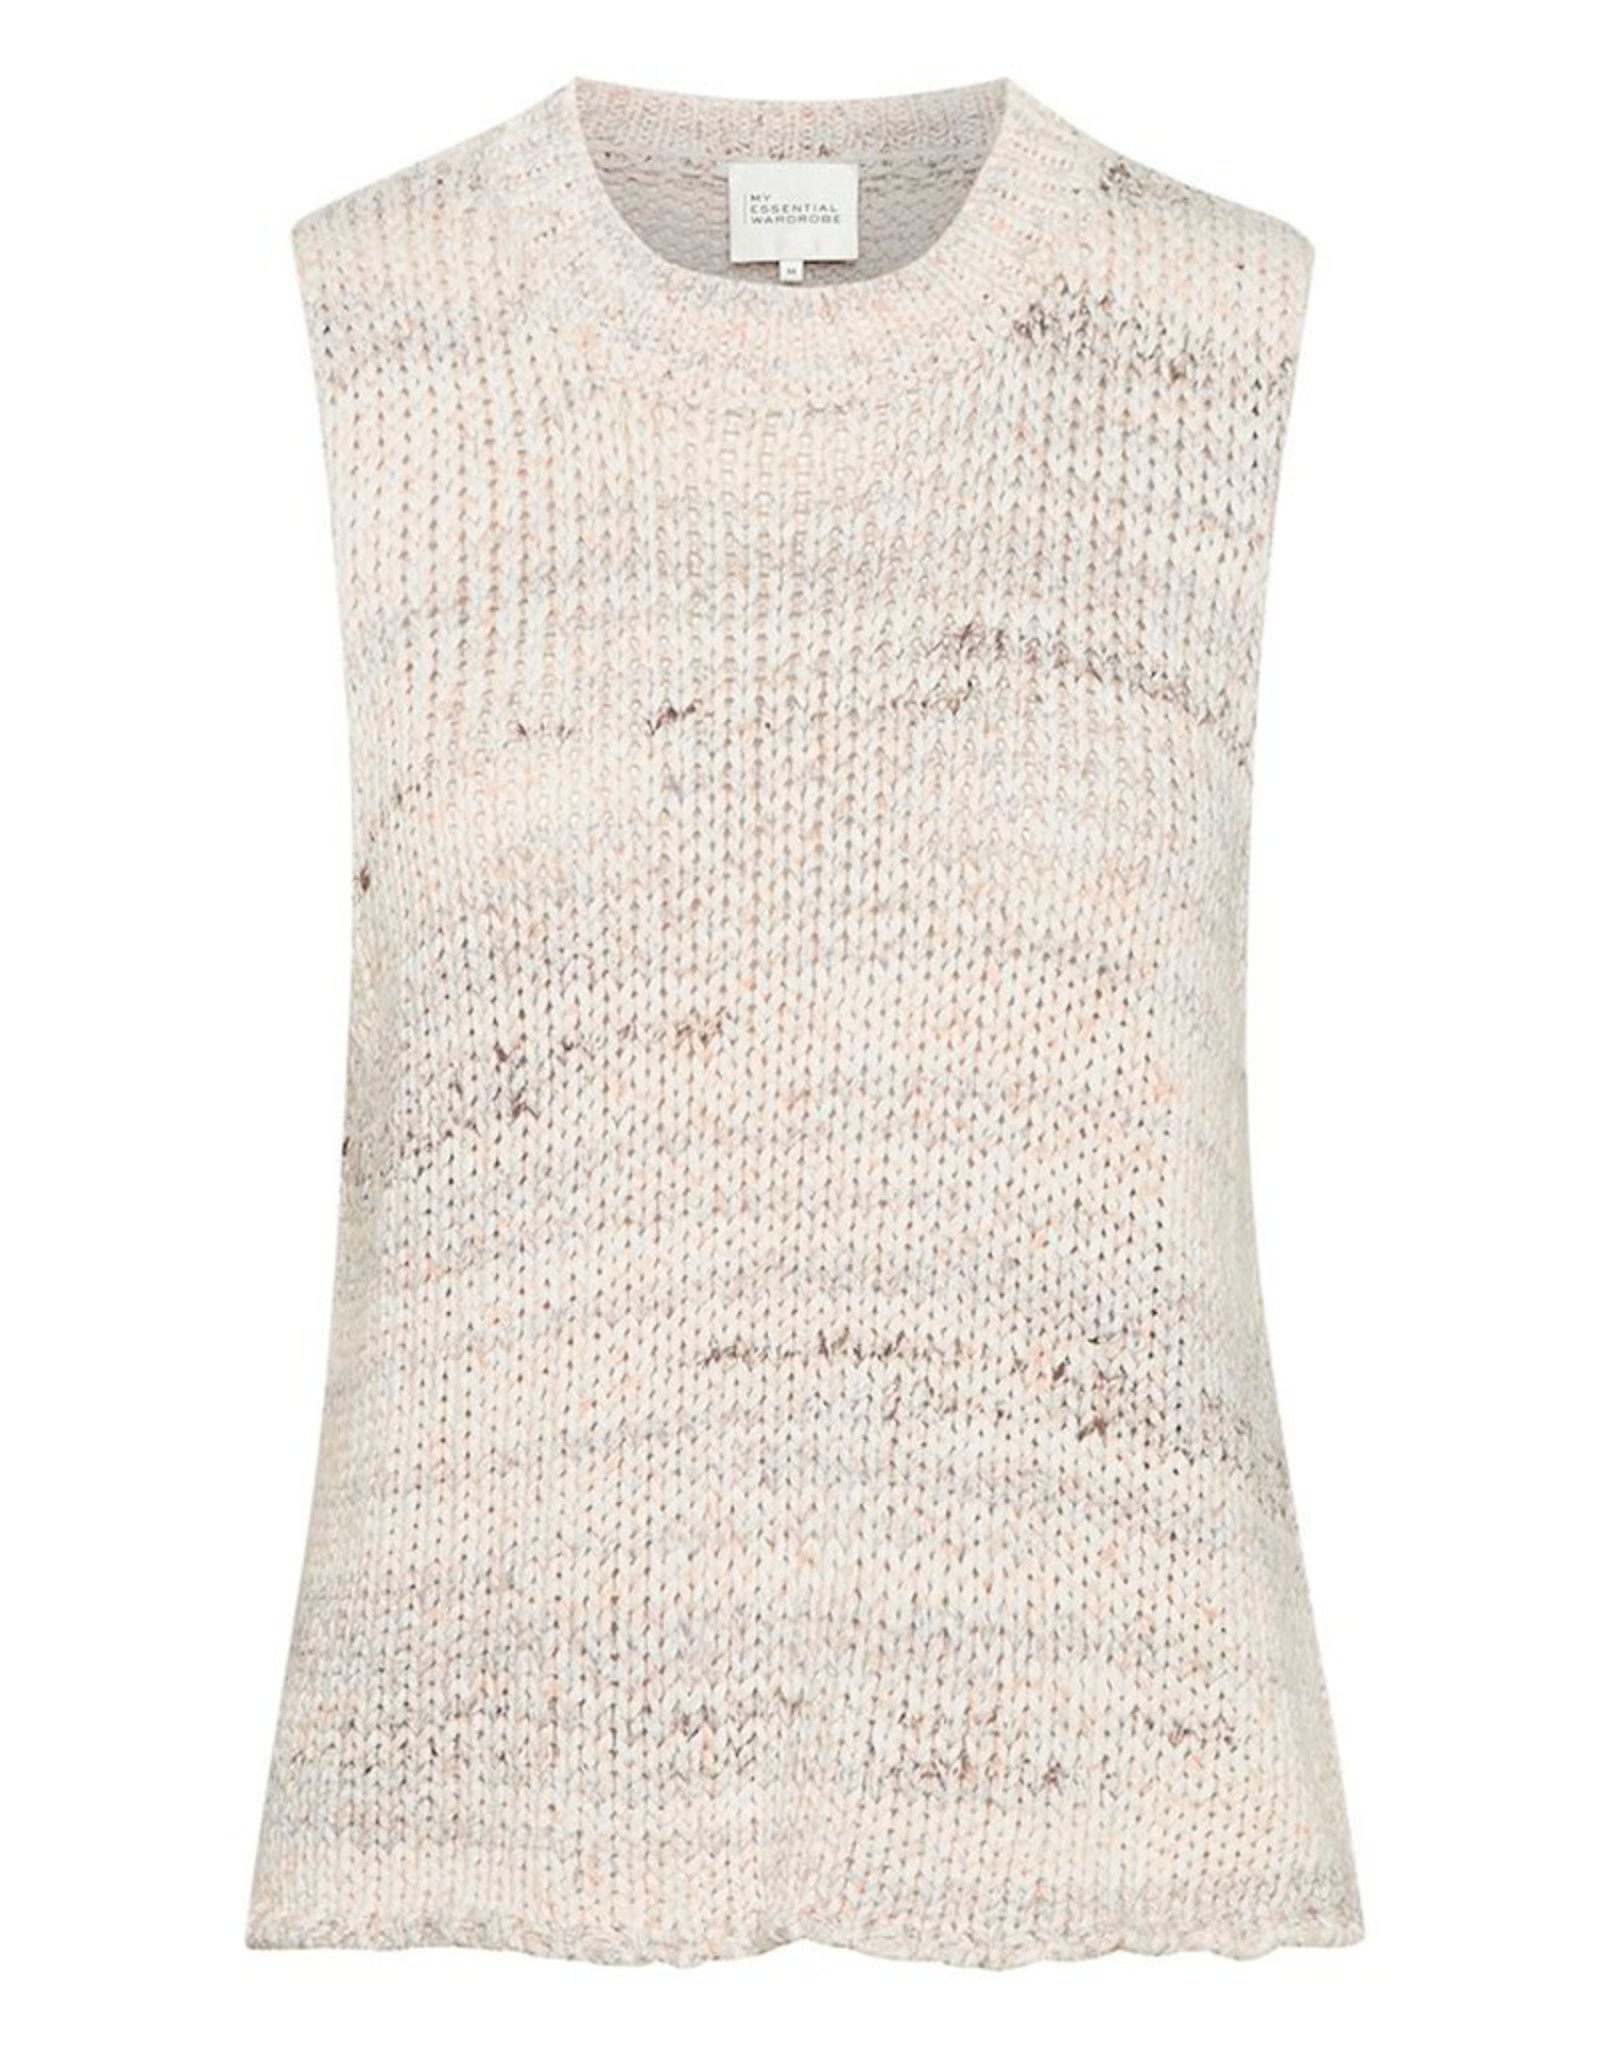 My Essential Wardrobe Cala knit vest